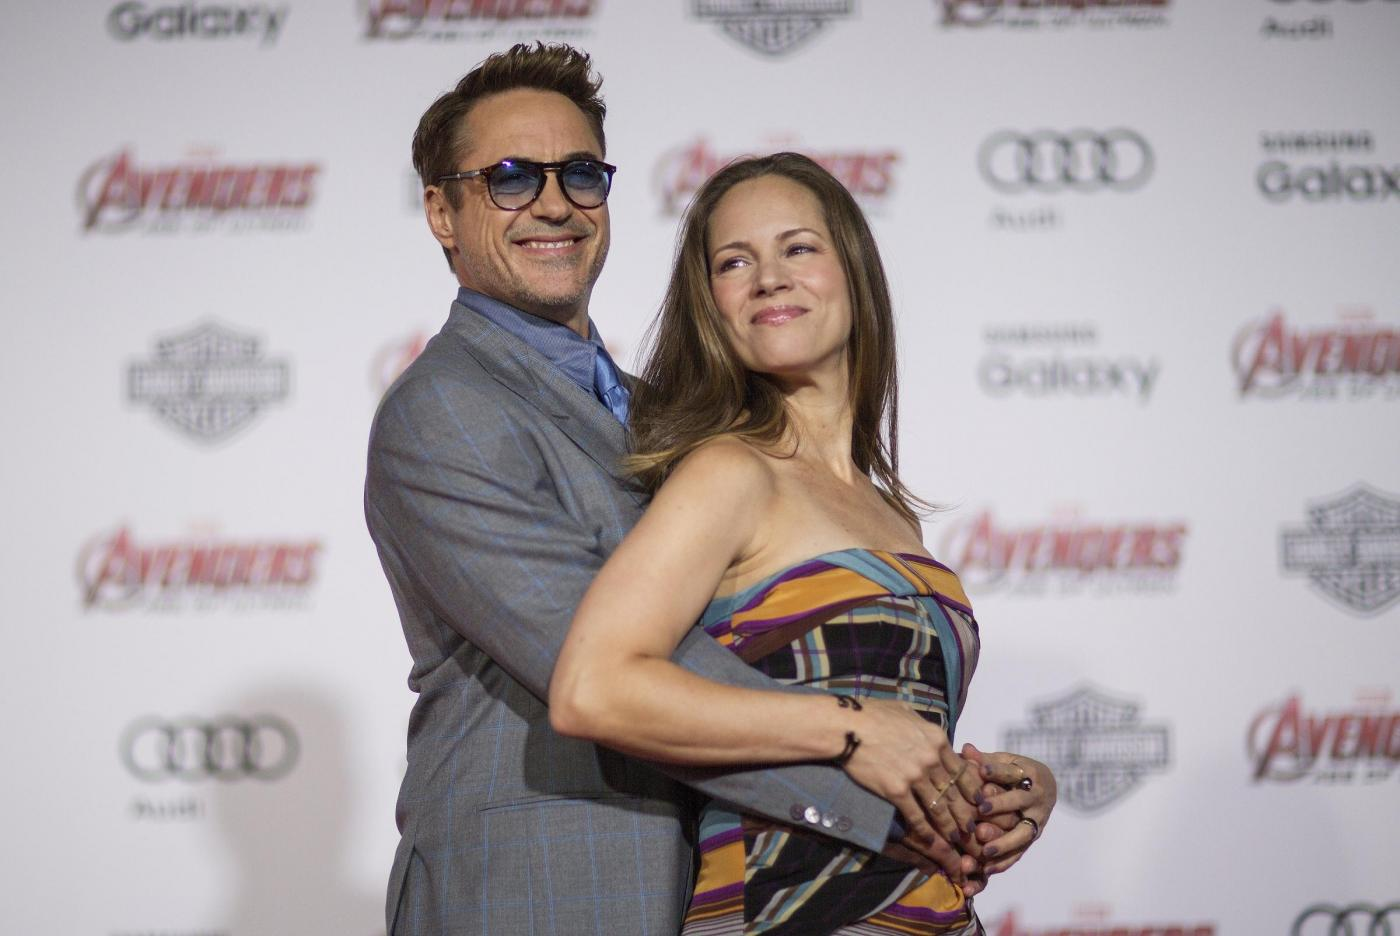 Avengers: Age of Ultron, anteprima mondiale a Hollywood con tutto il cast stellare